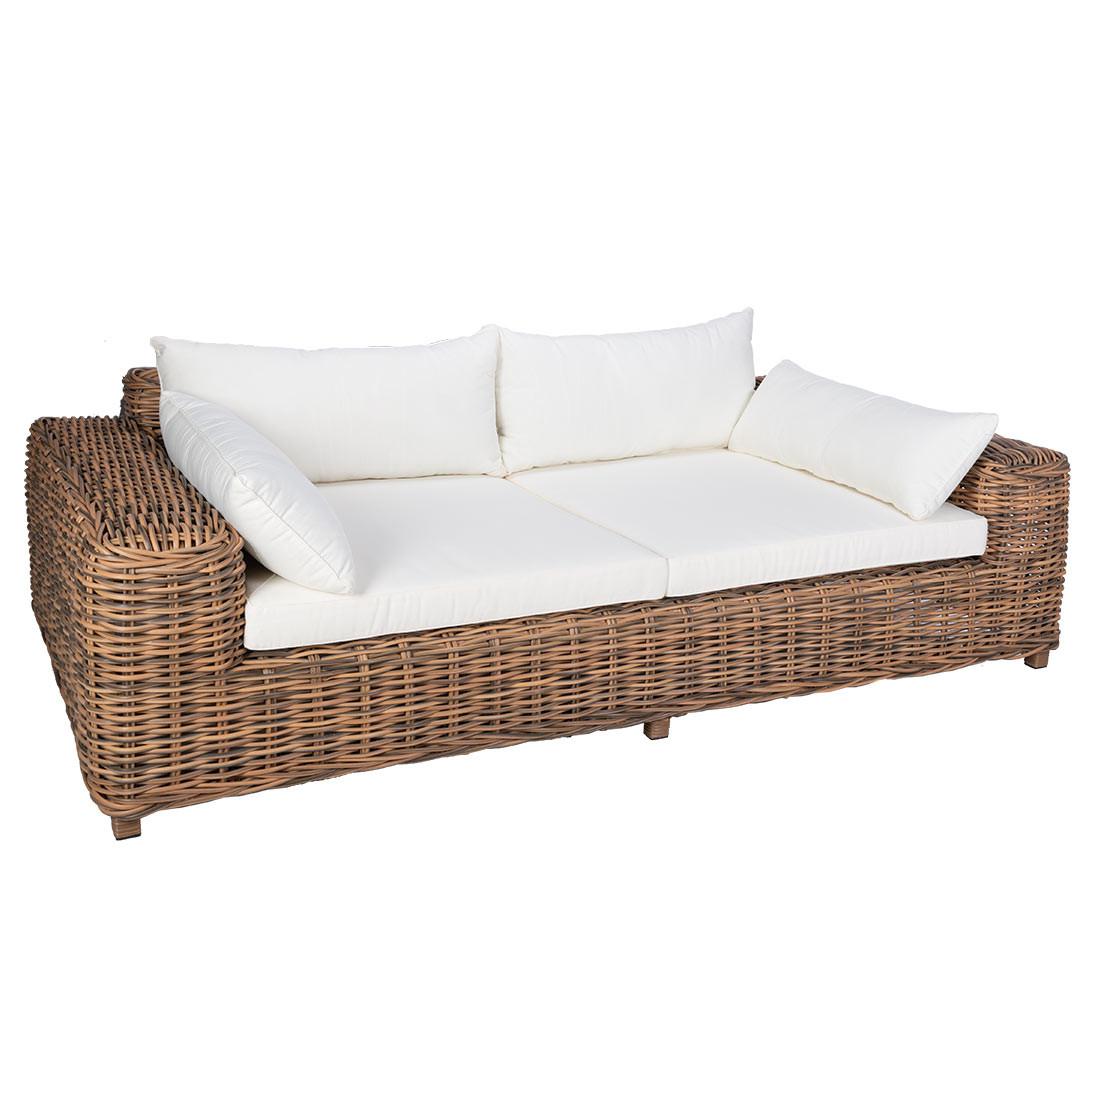 Full Size of Lounge Sofa Balkon Klein Caseconradcom Wohnzimmer Outliv Odense